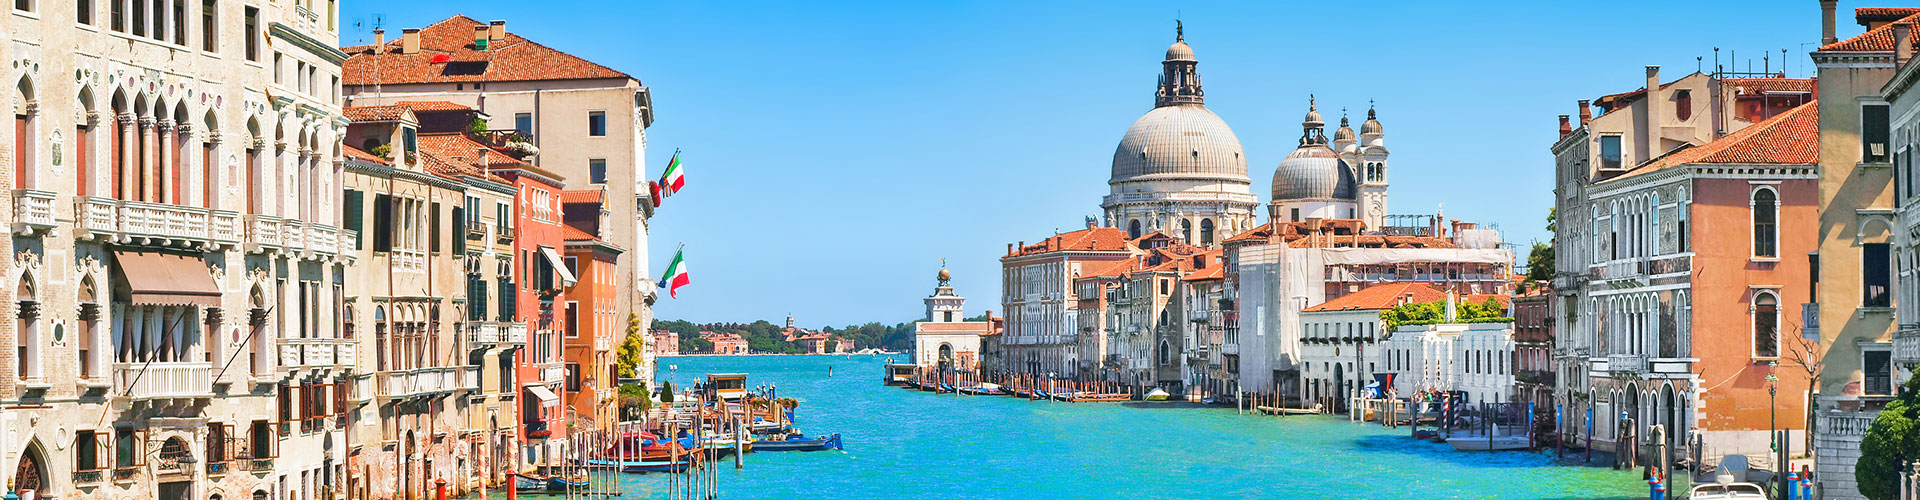 Canal Grande, Venezia - Italia